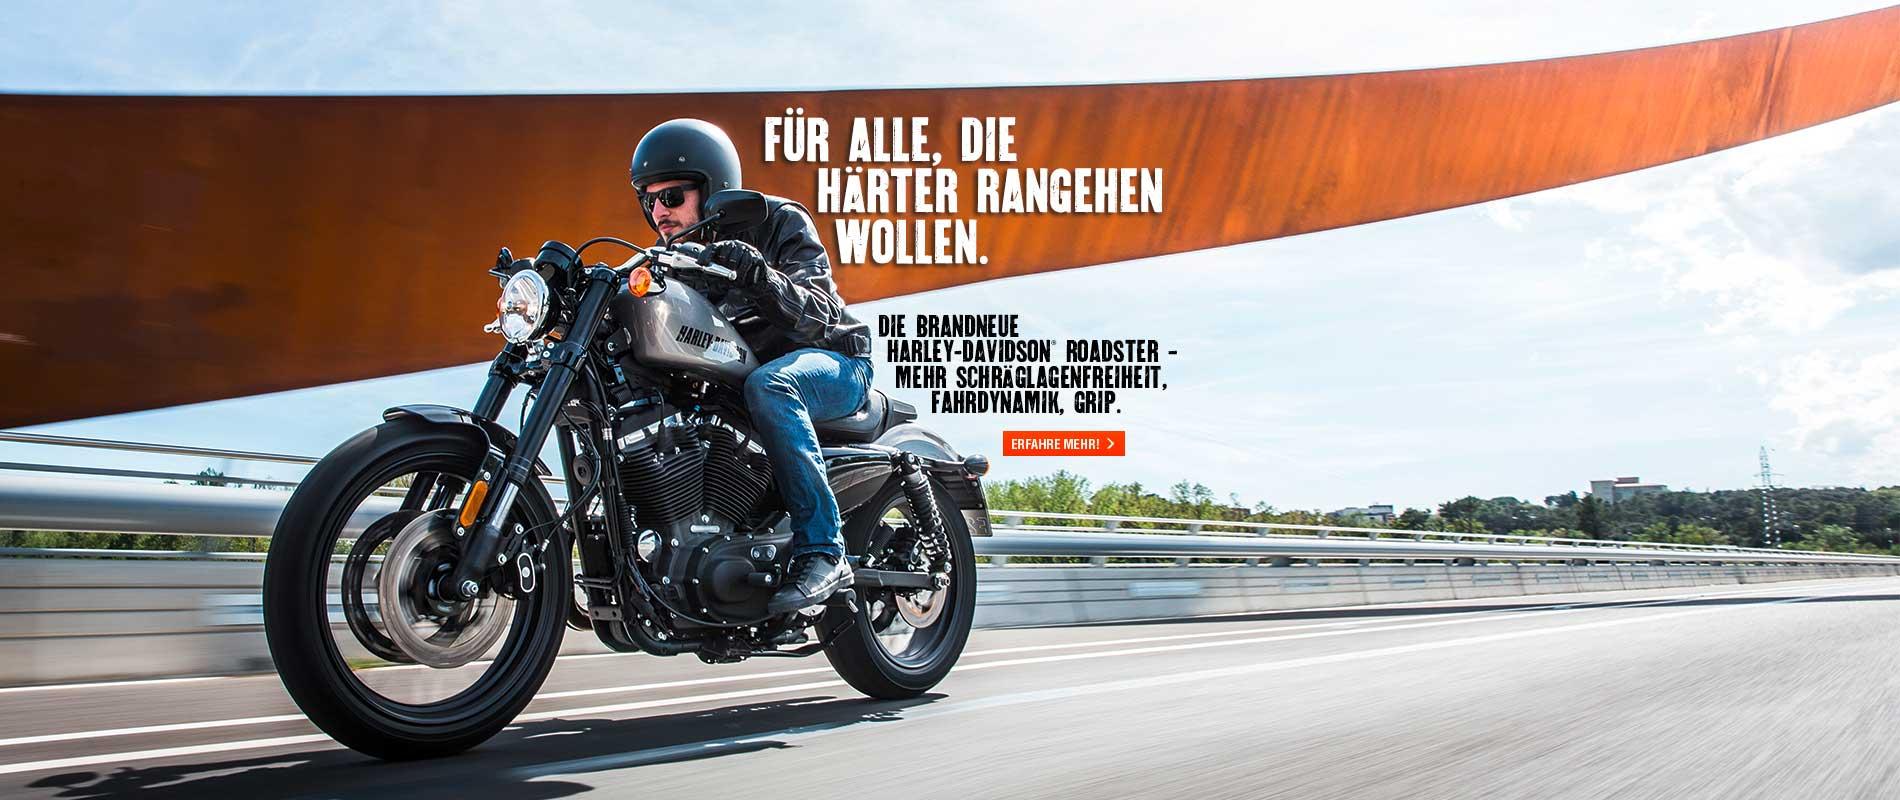 HD_Regensburg_Billboards_Roadsterkl